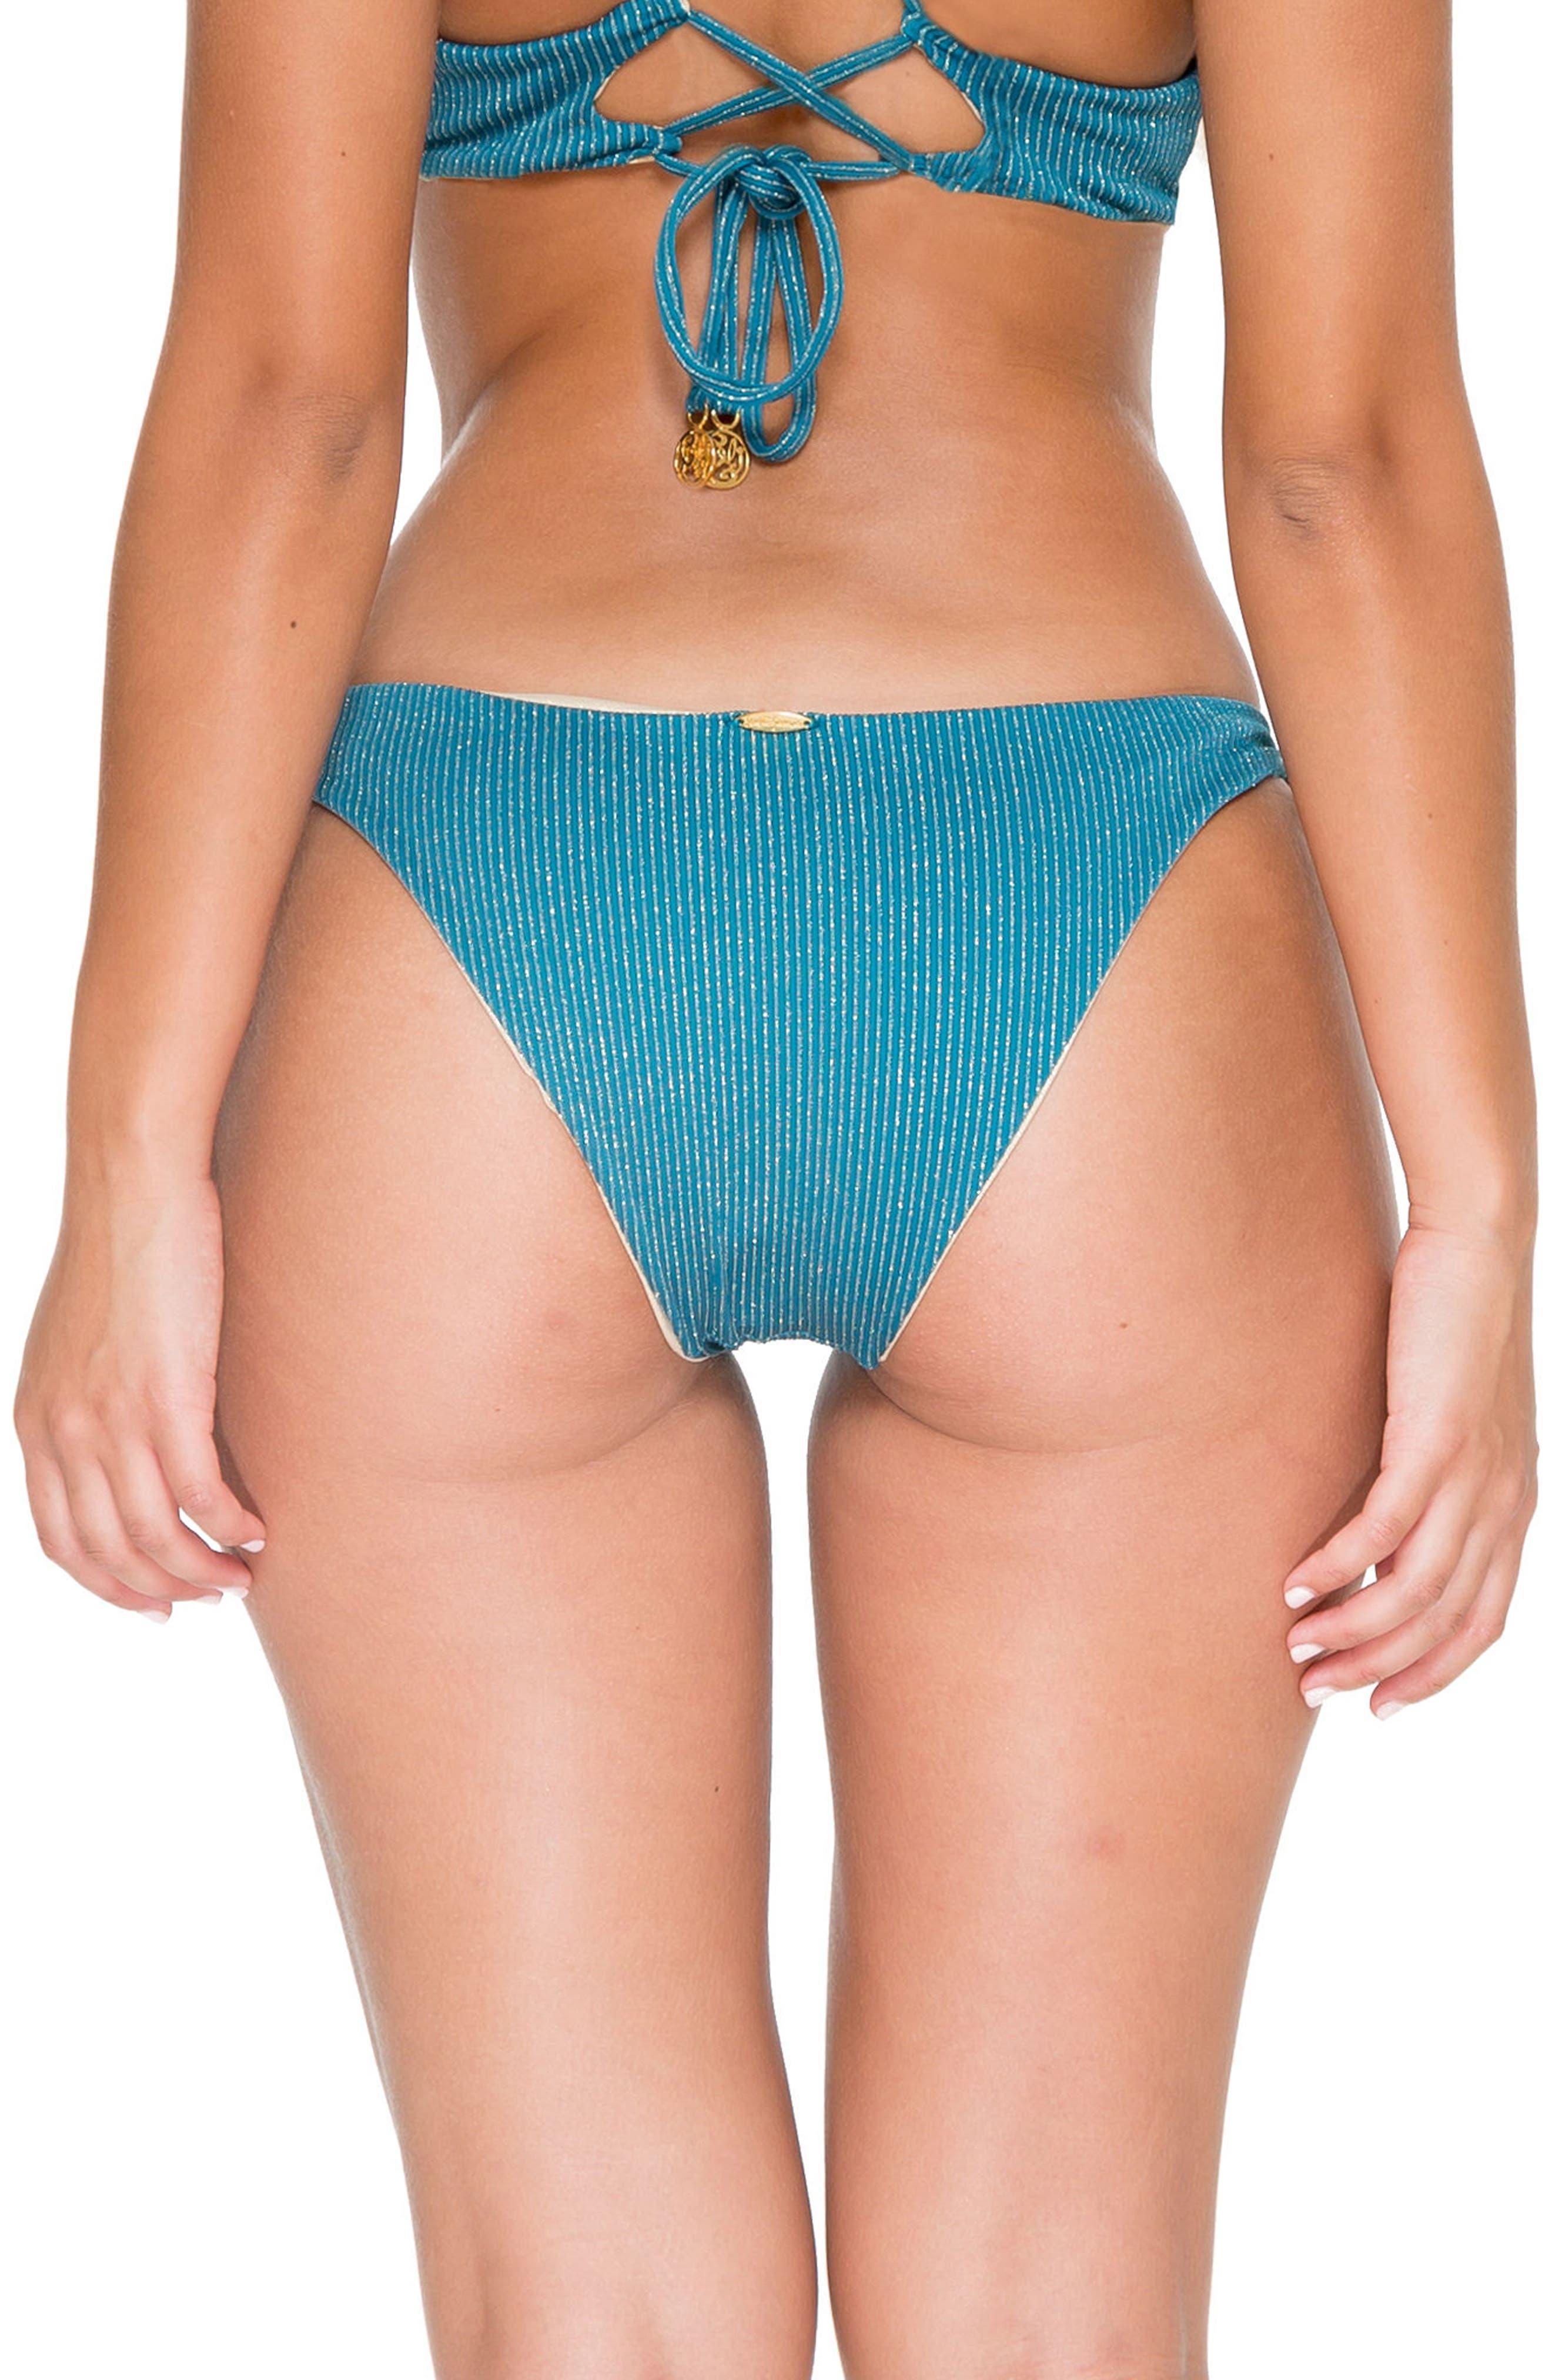 Cayo Hueso Reversible Bikini Bottoms,                             Alternate thumbnail 2, color,                             Miramar Blue/ Gold